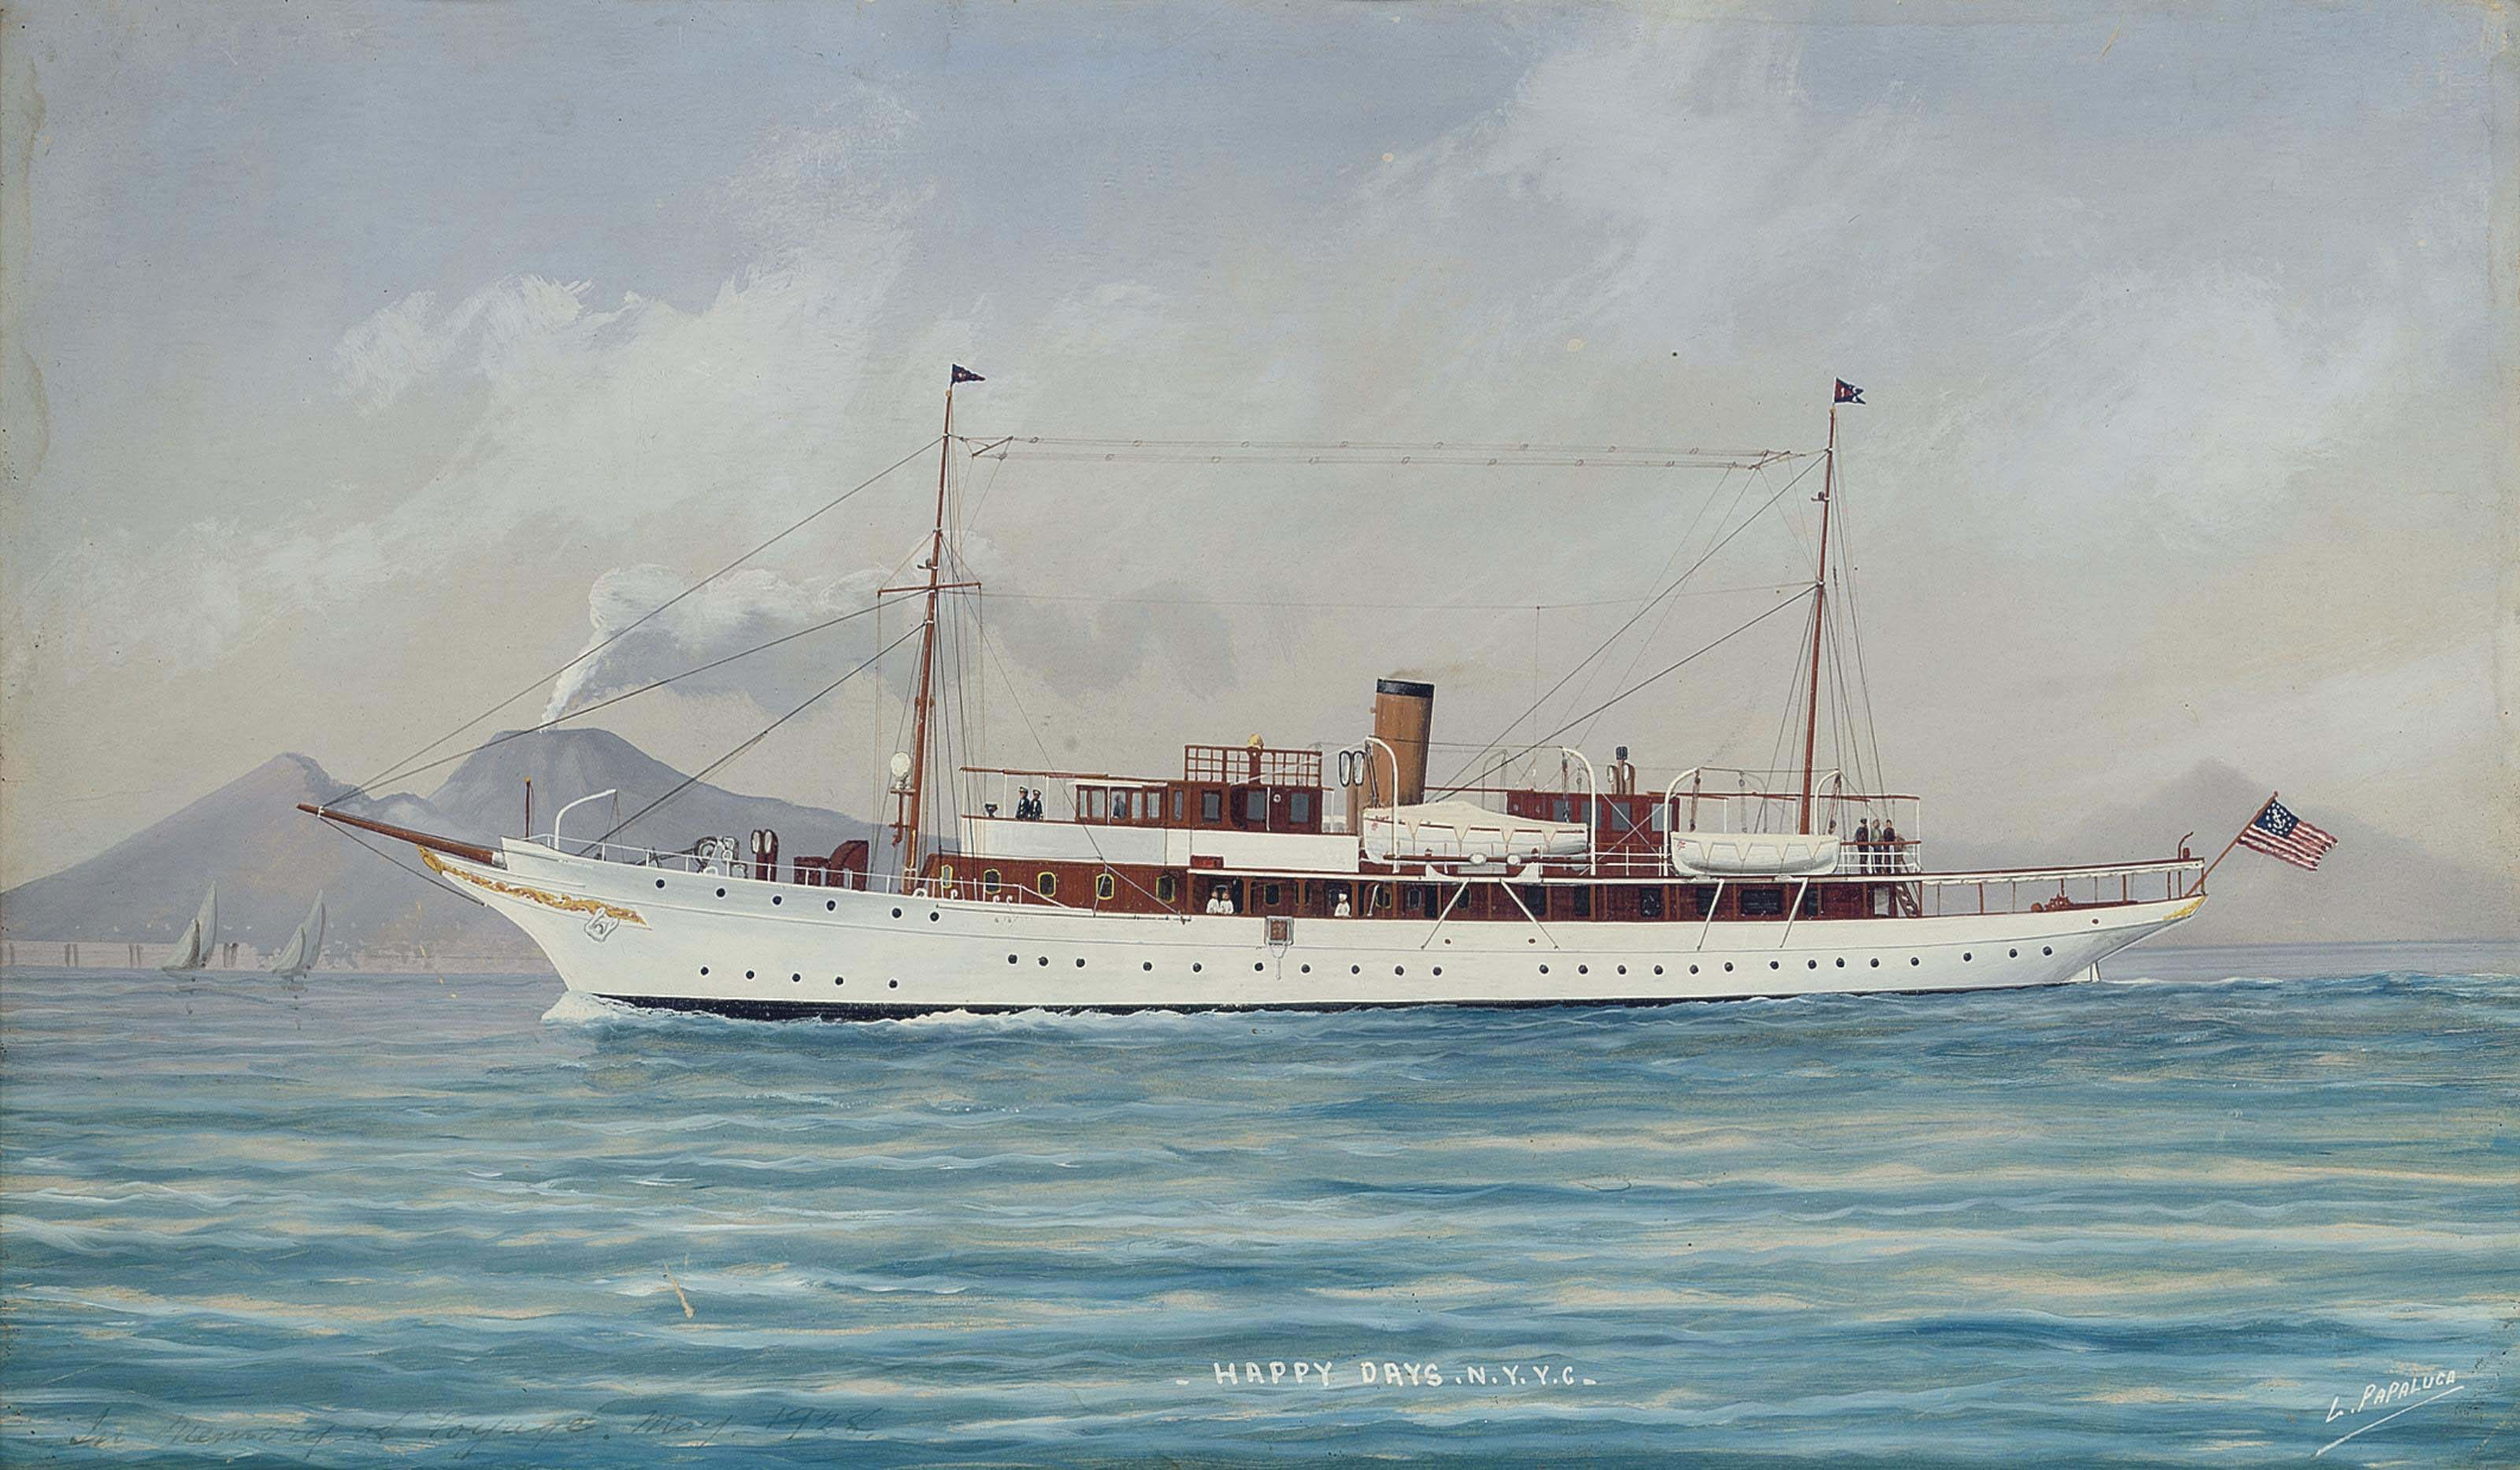 The New York Yacht Club's steam yacht Happy Days in Mediterranean waters off Naples, 1928